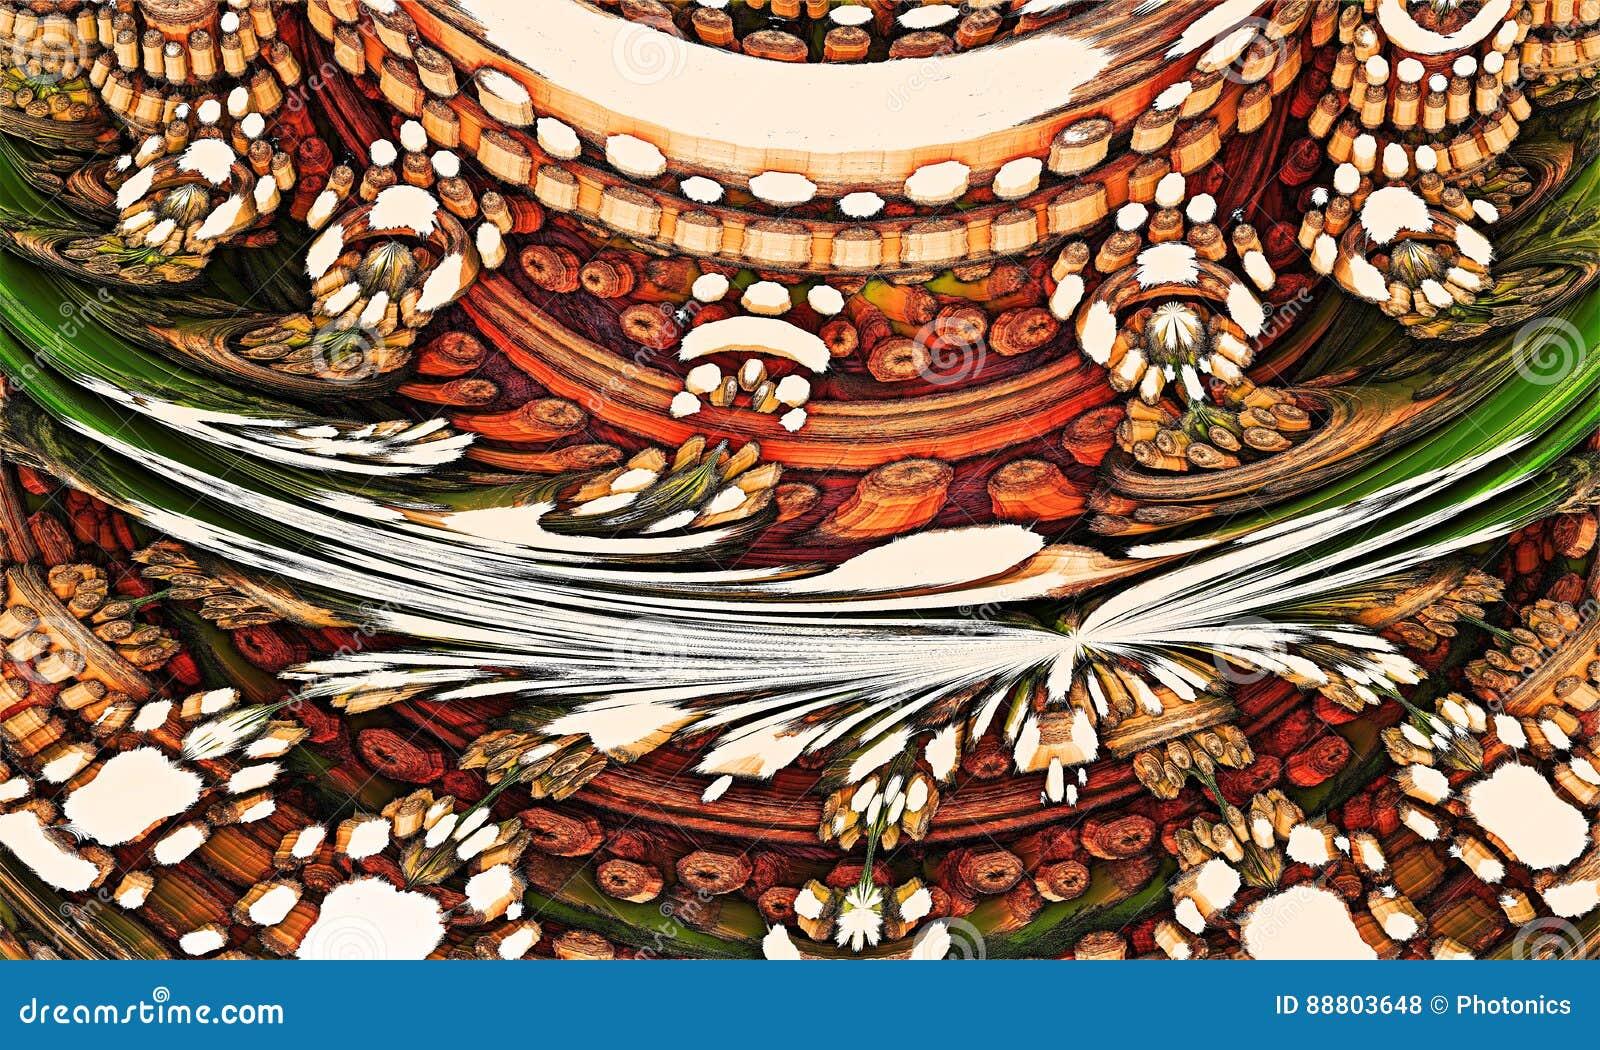 Rustic Pattern